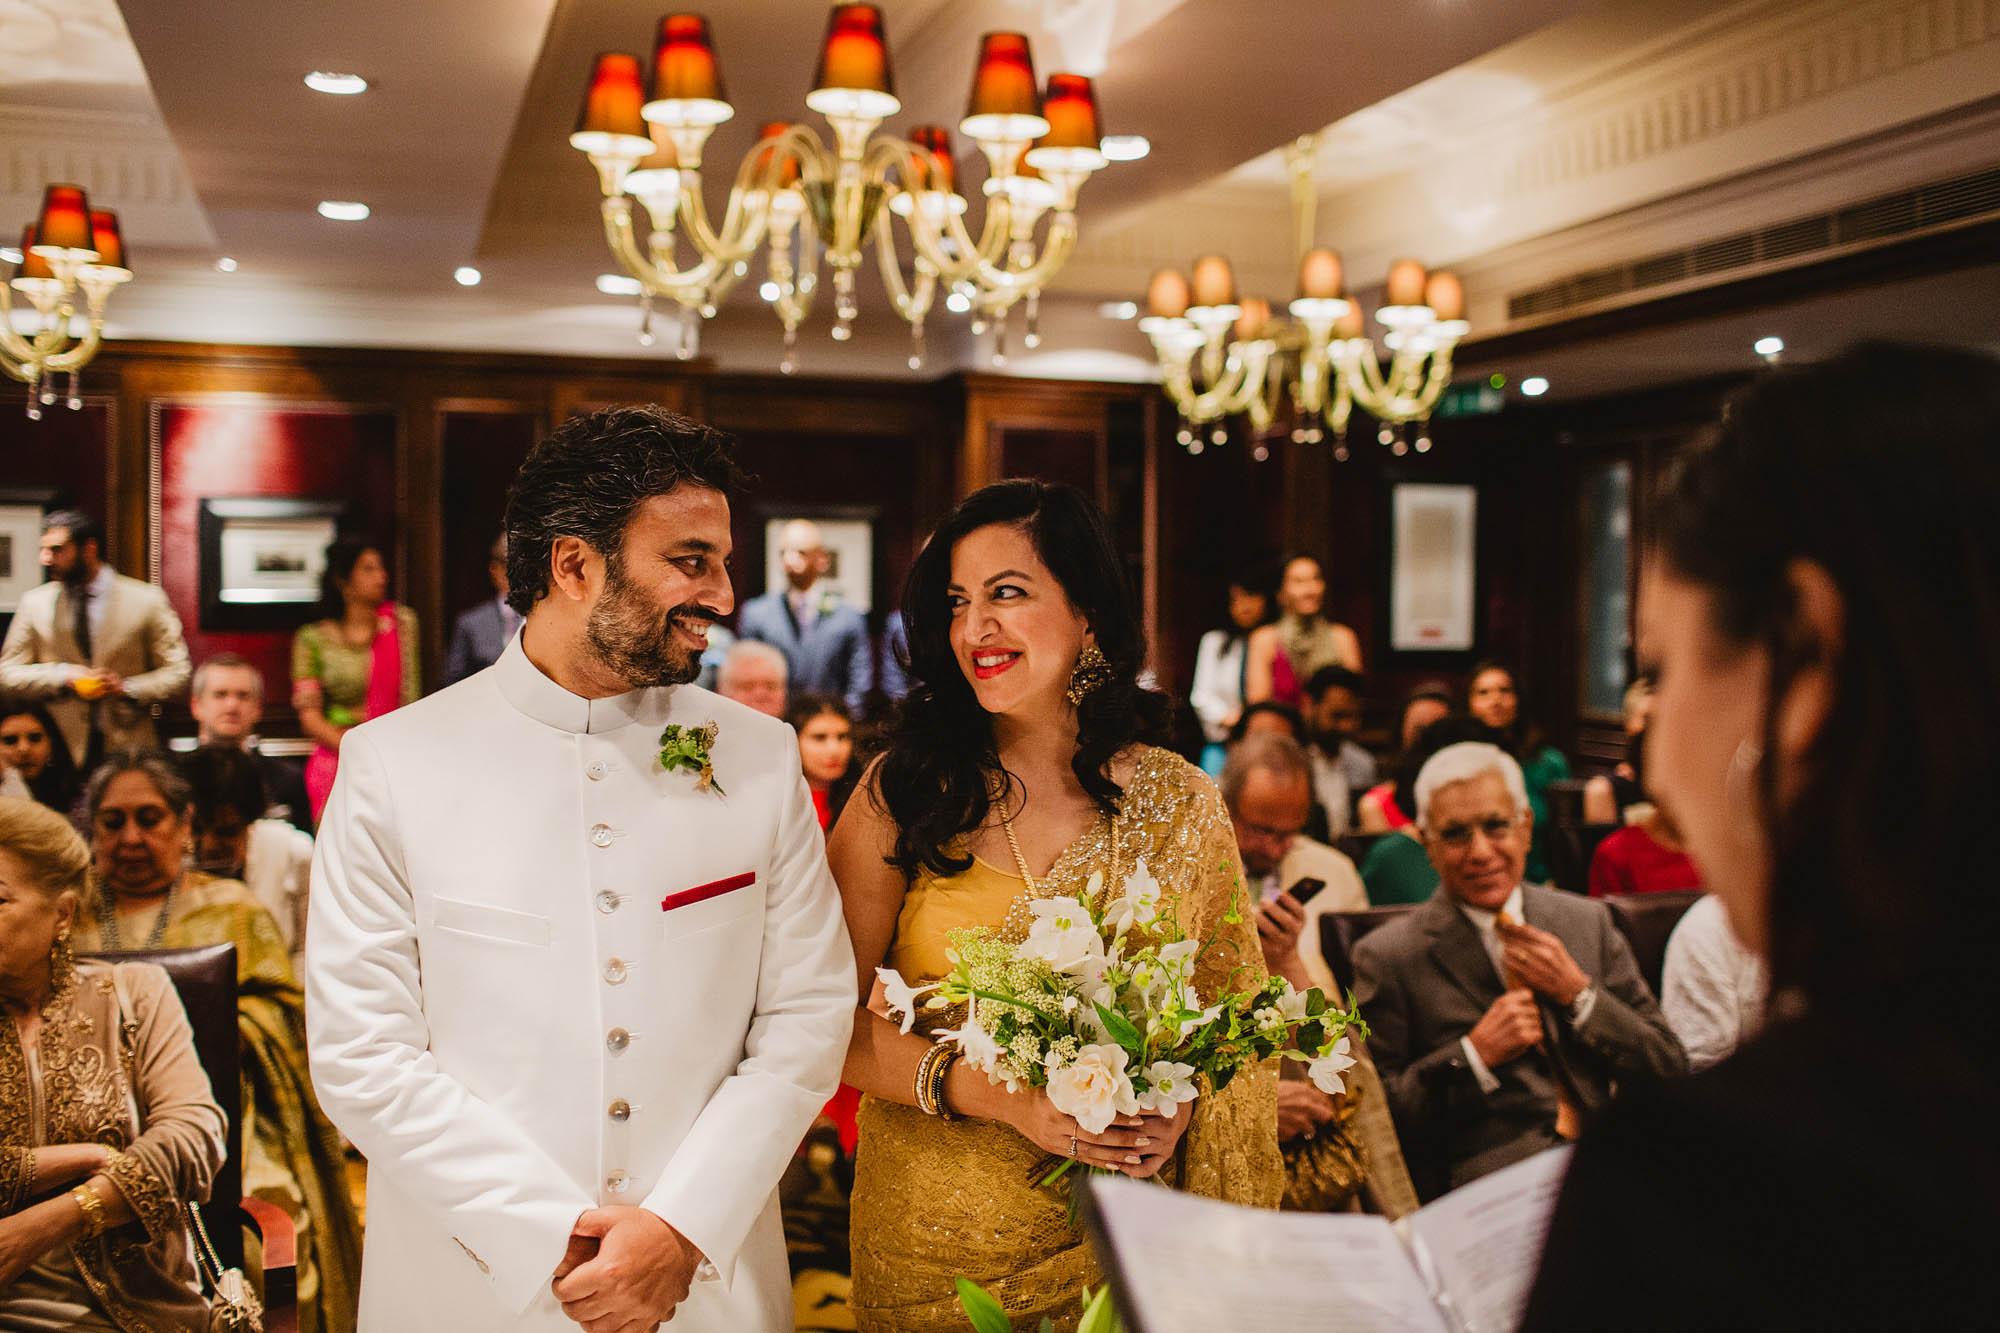 Goring hotel London wedding 16